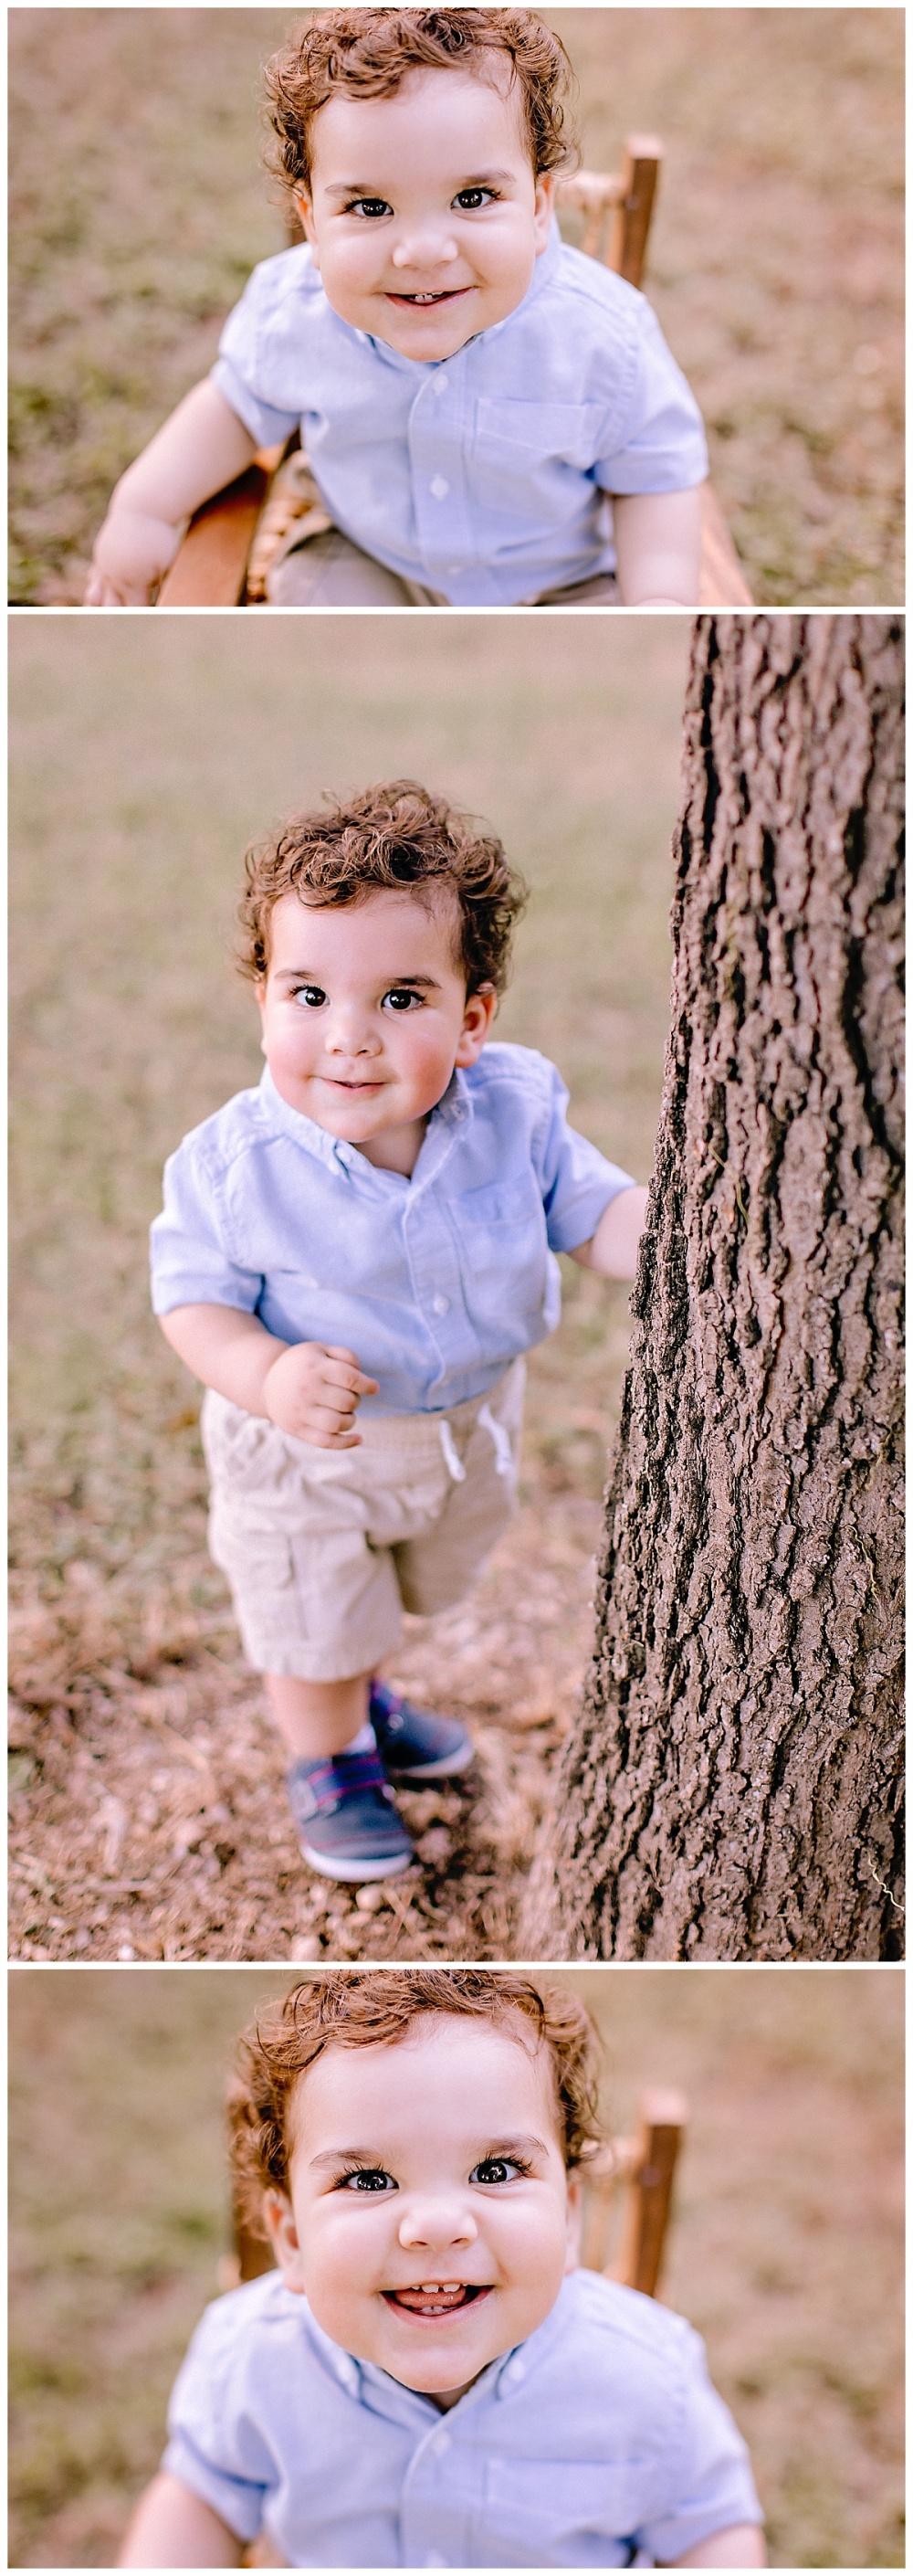 Carly-Barton-Photography-Birthday-Session-Schertz-Texas-Veterans-Park-1-year-family-photos-James_0001.jpg